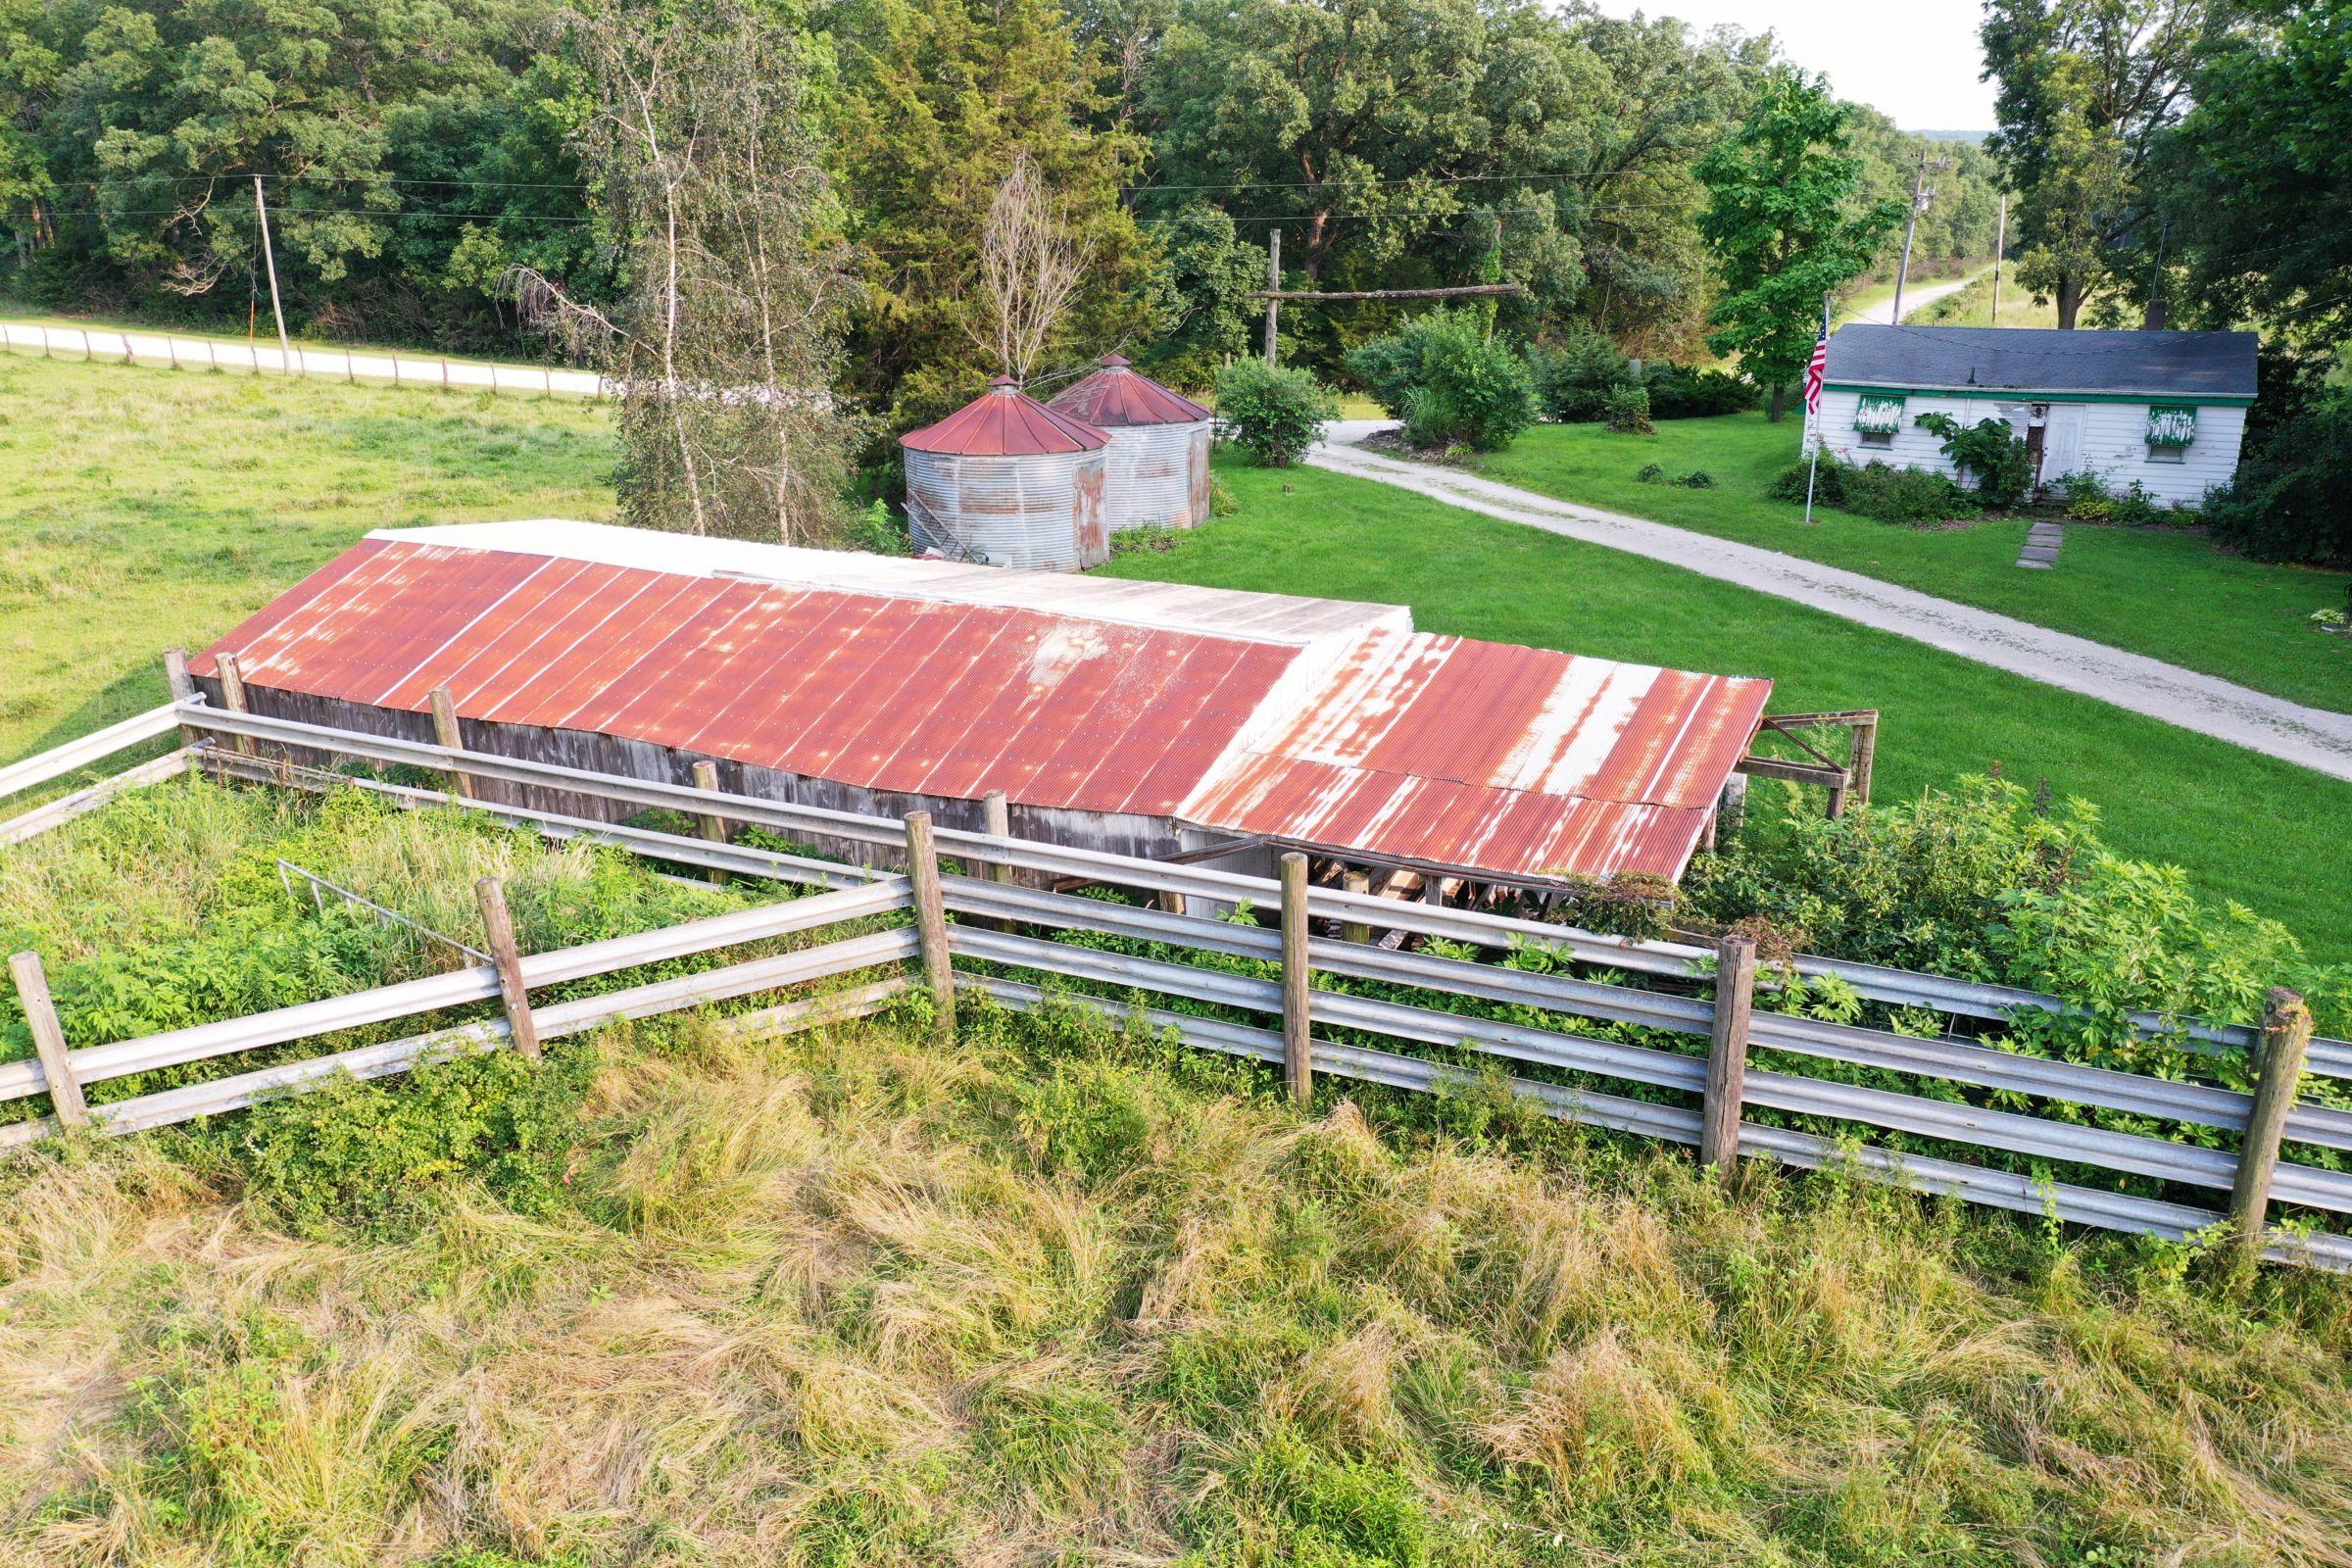 land-lee-county-iowa-340-acres-listing-number-15649-6-2021-07-21-185544.jpg